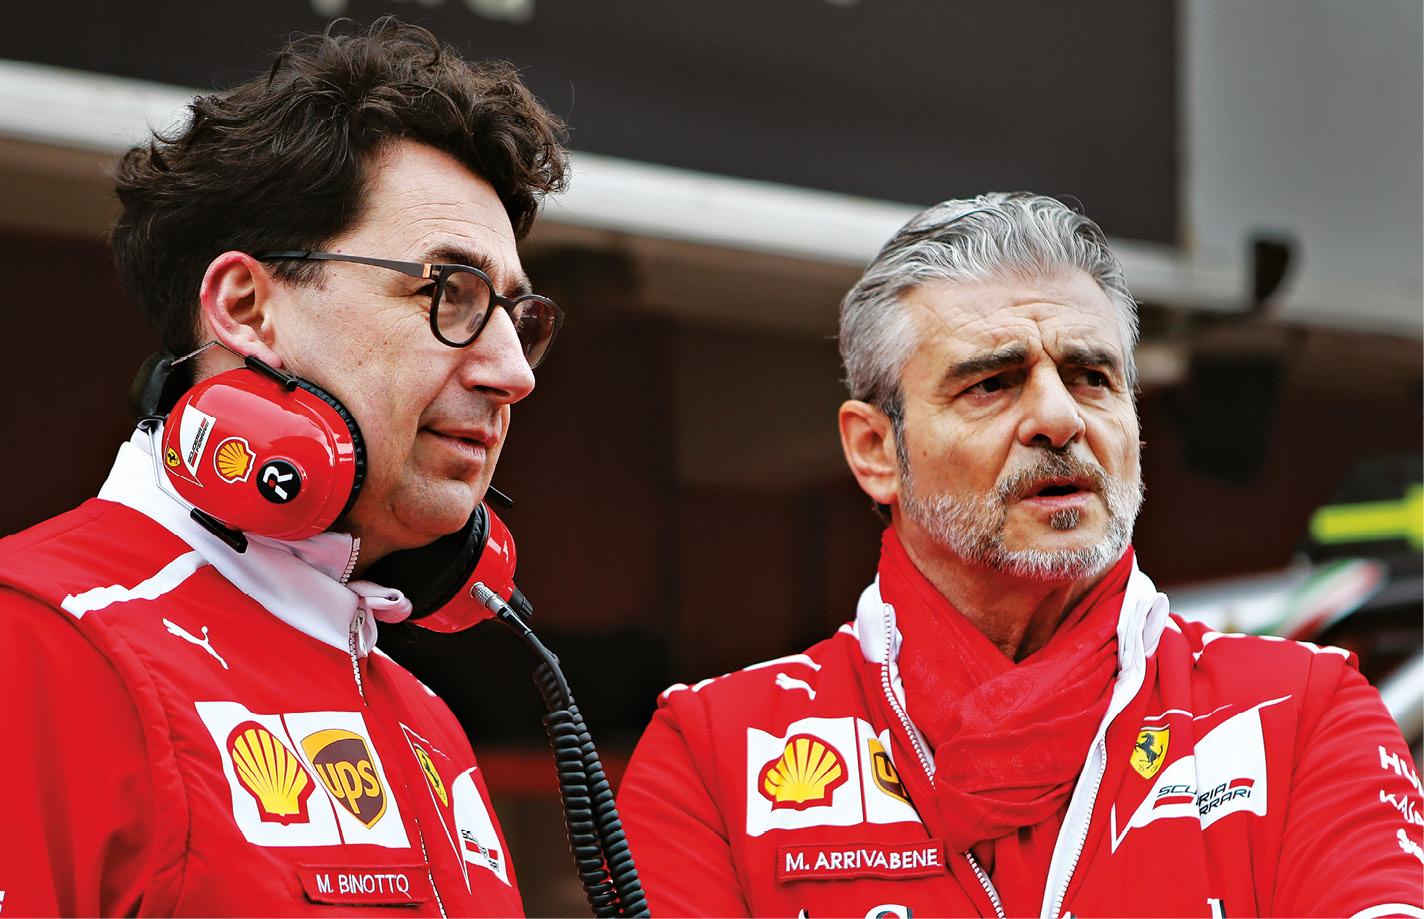 Present and past: Binotto with ousted Ferrari team principal Maurizio Arrivabene, right